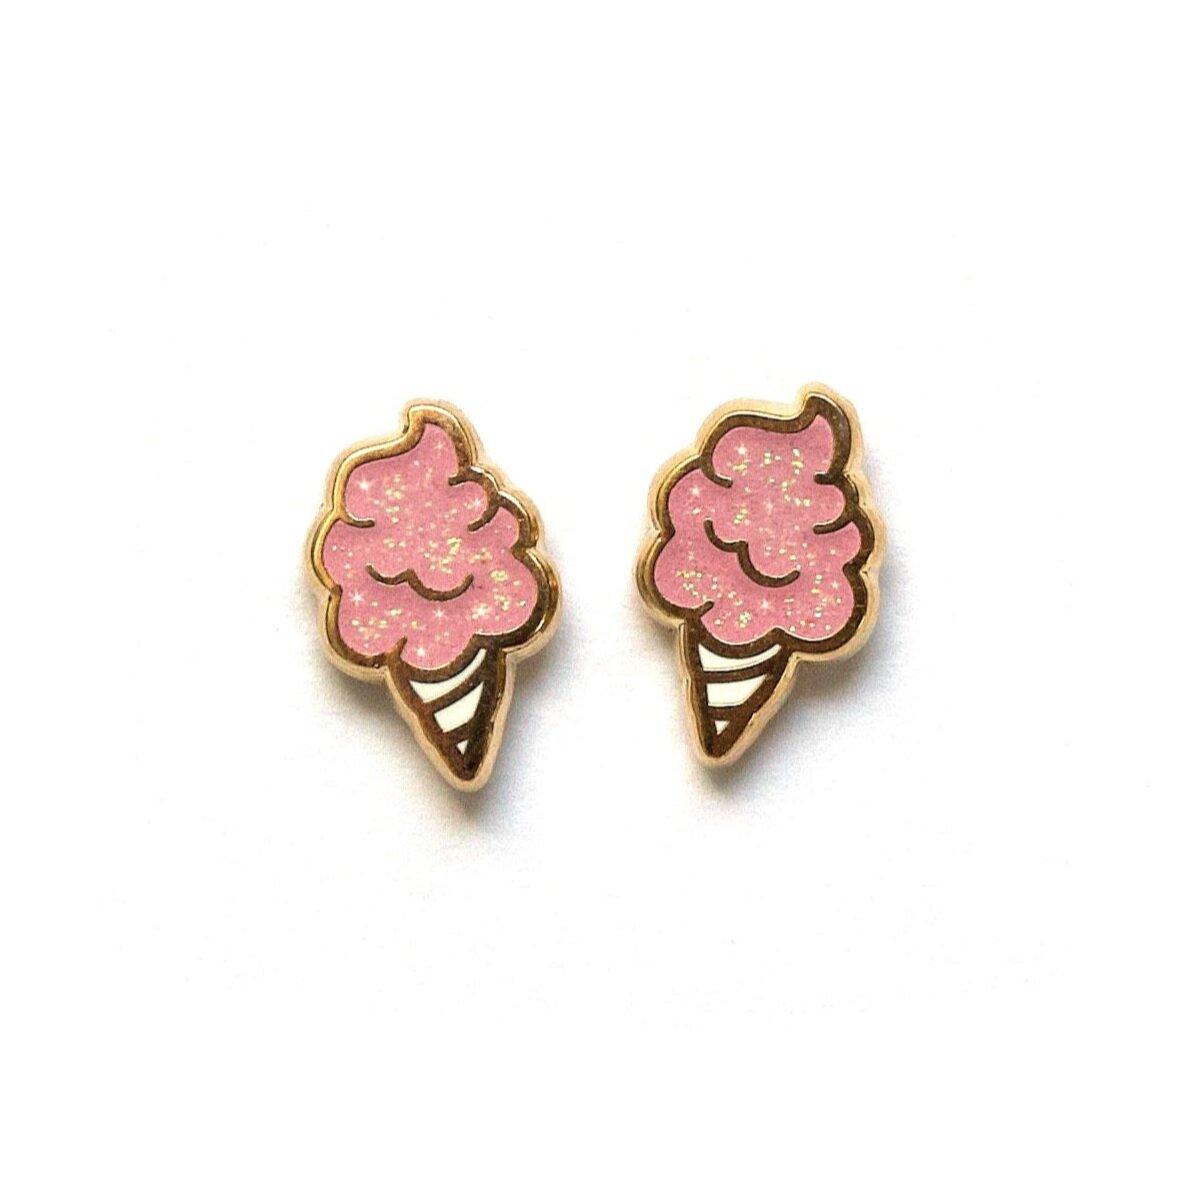 E26 - Cotton Candy Earrings